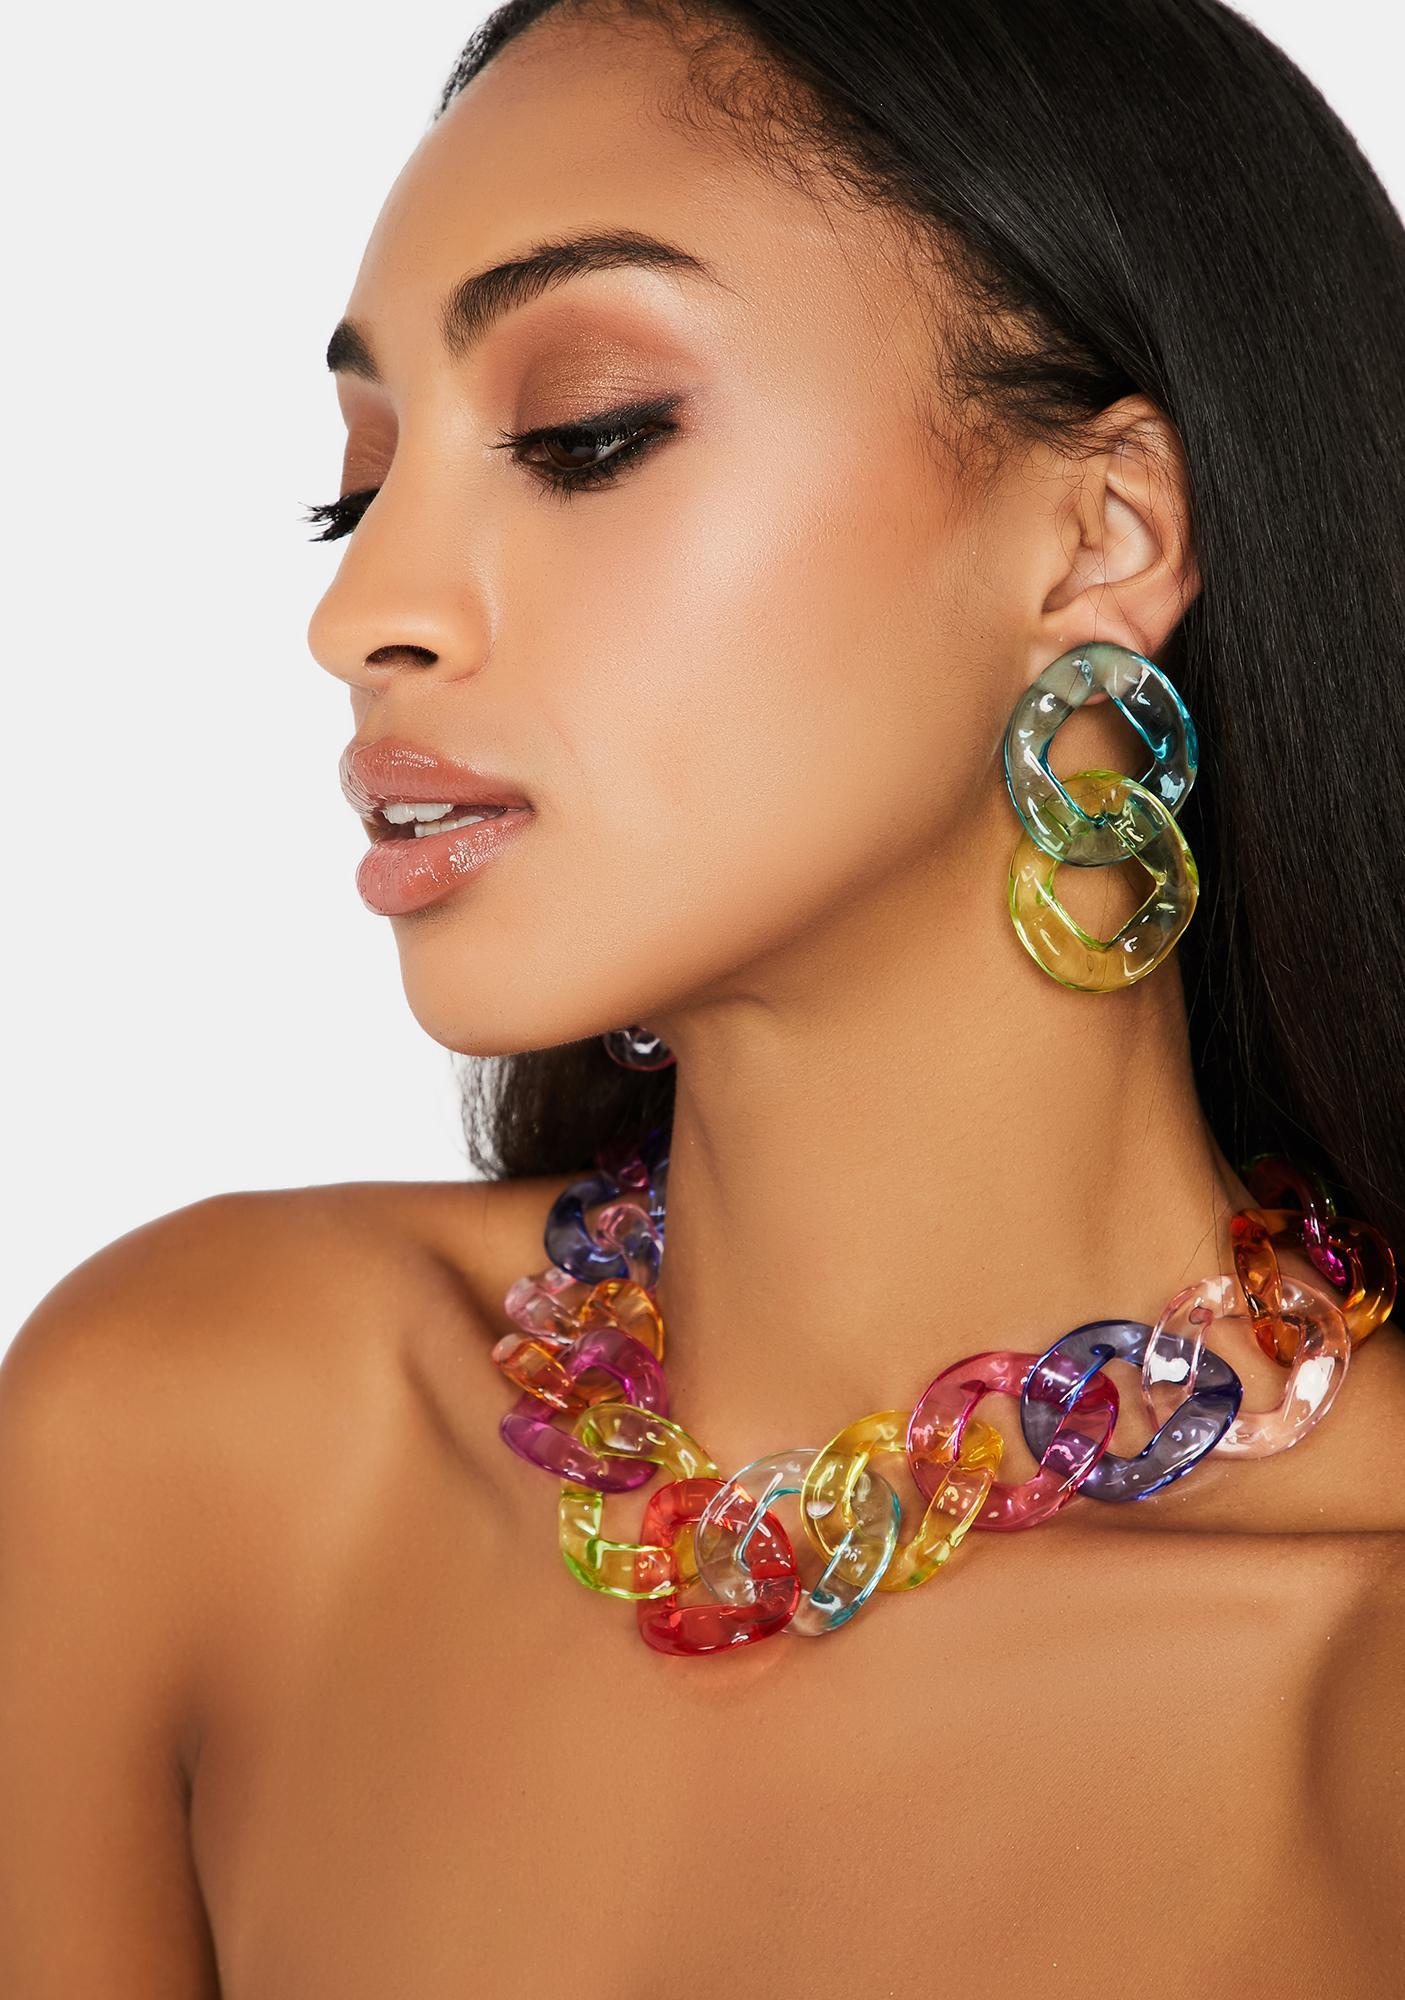 Prismatica Chain Earrings & Necklace Set